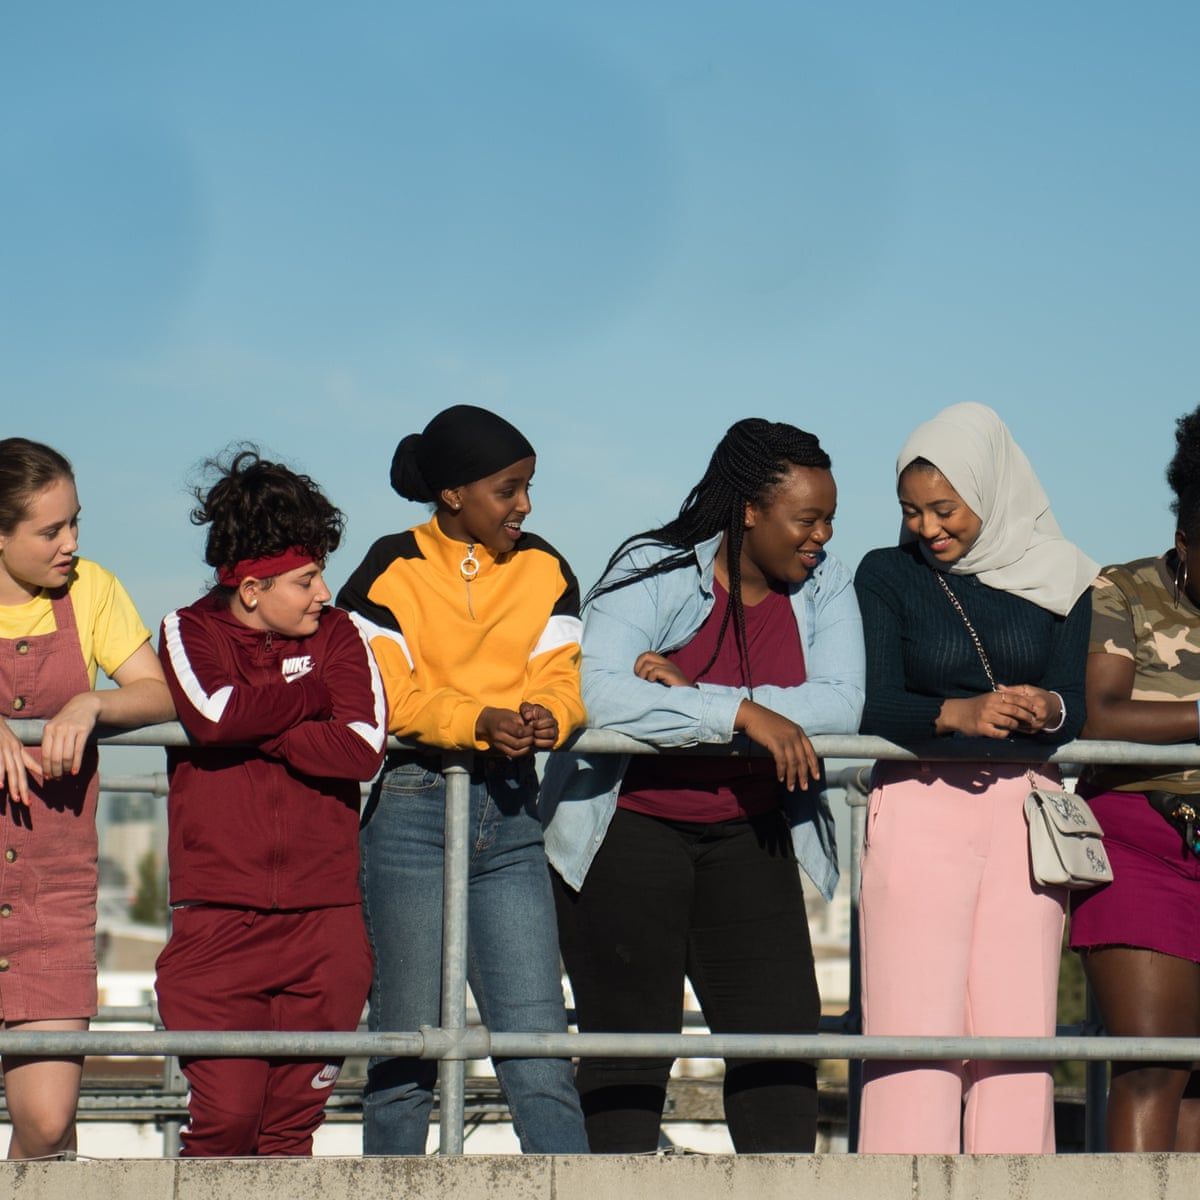 Rocks review - empowering, uplifting teenage girl power | Drama films | The  Guardian